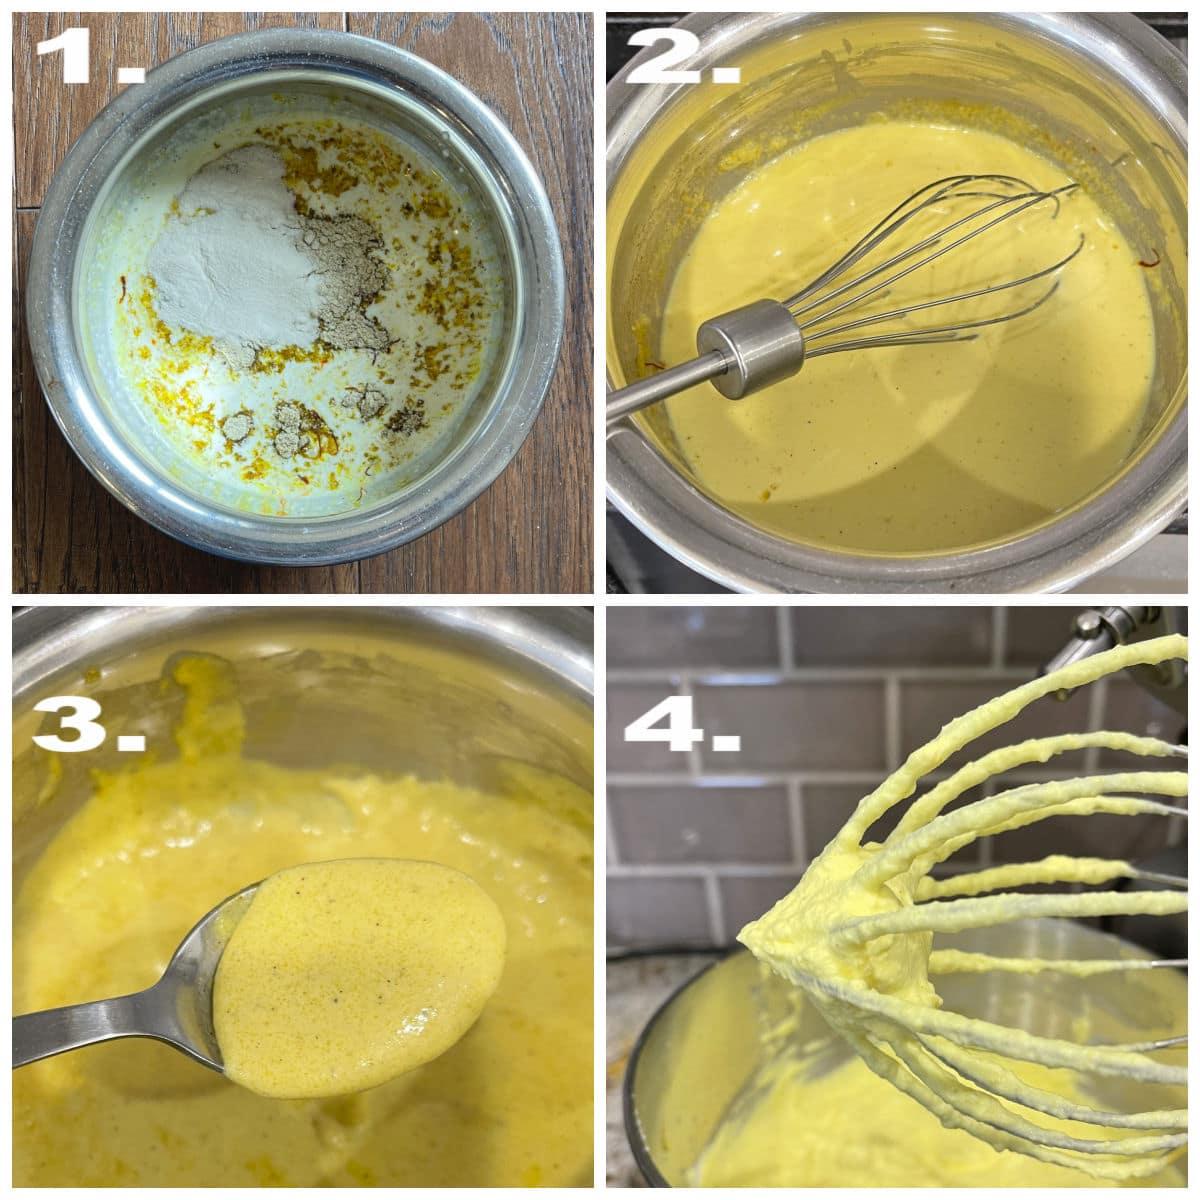 Steps in activating agar agar milk mixture